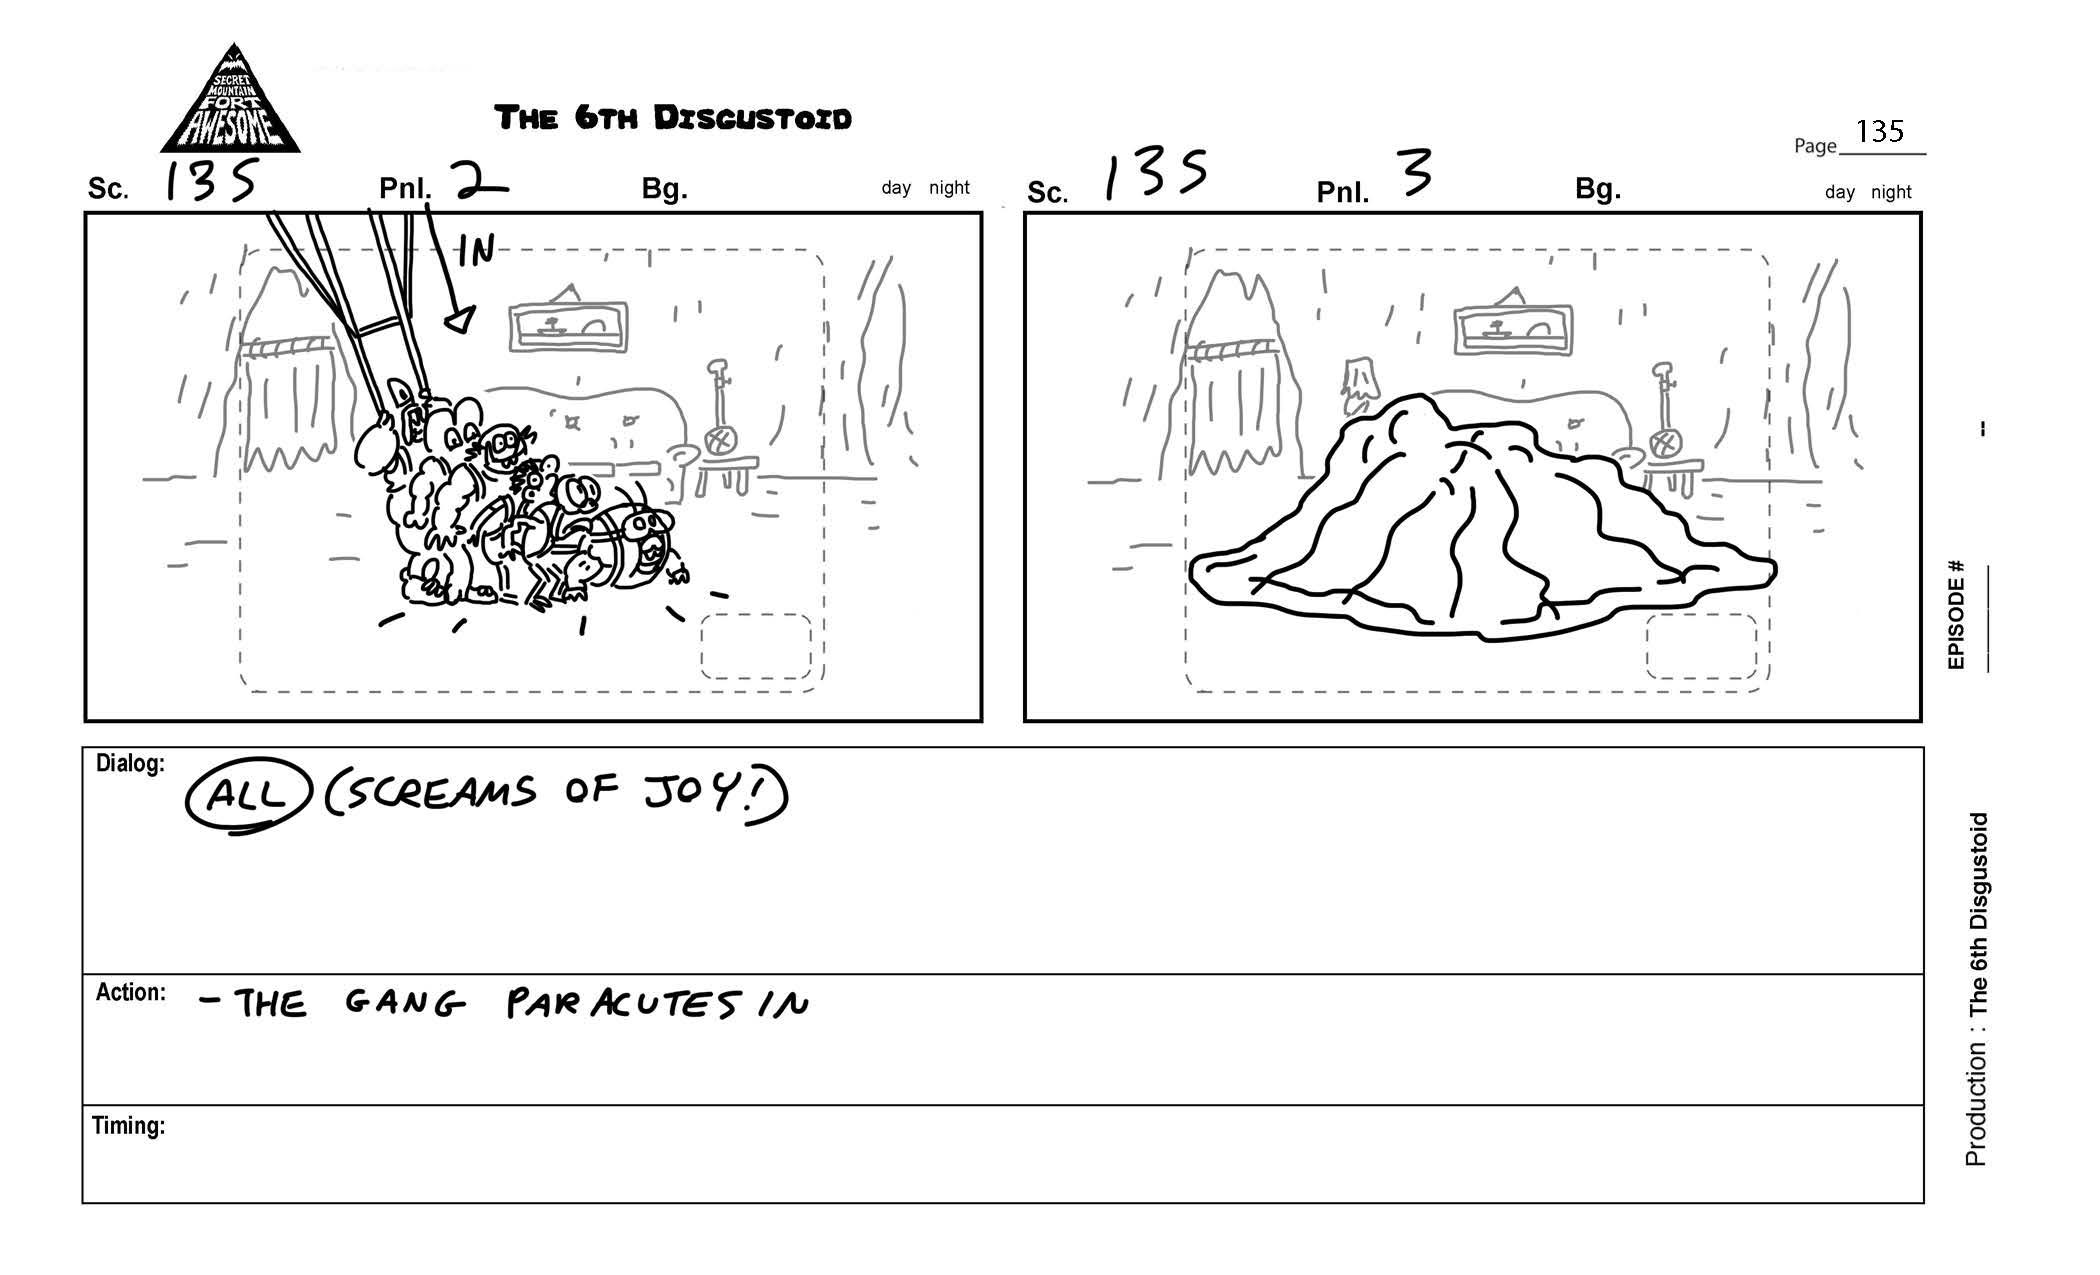 SMFA_SixthDisgustoid_Page_135.jpg